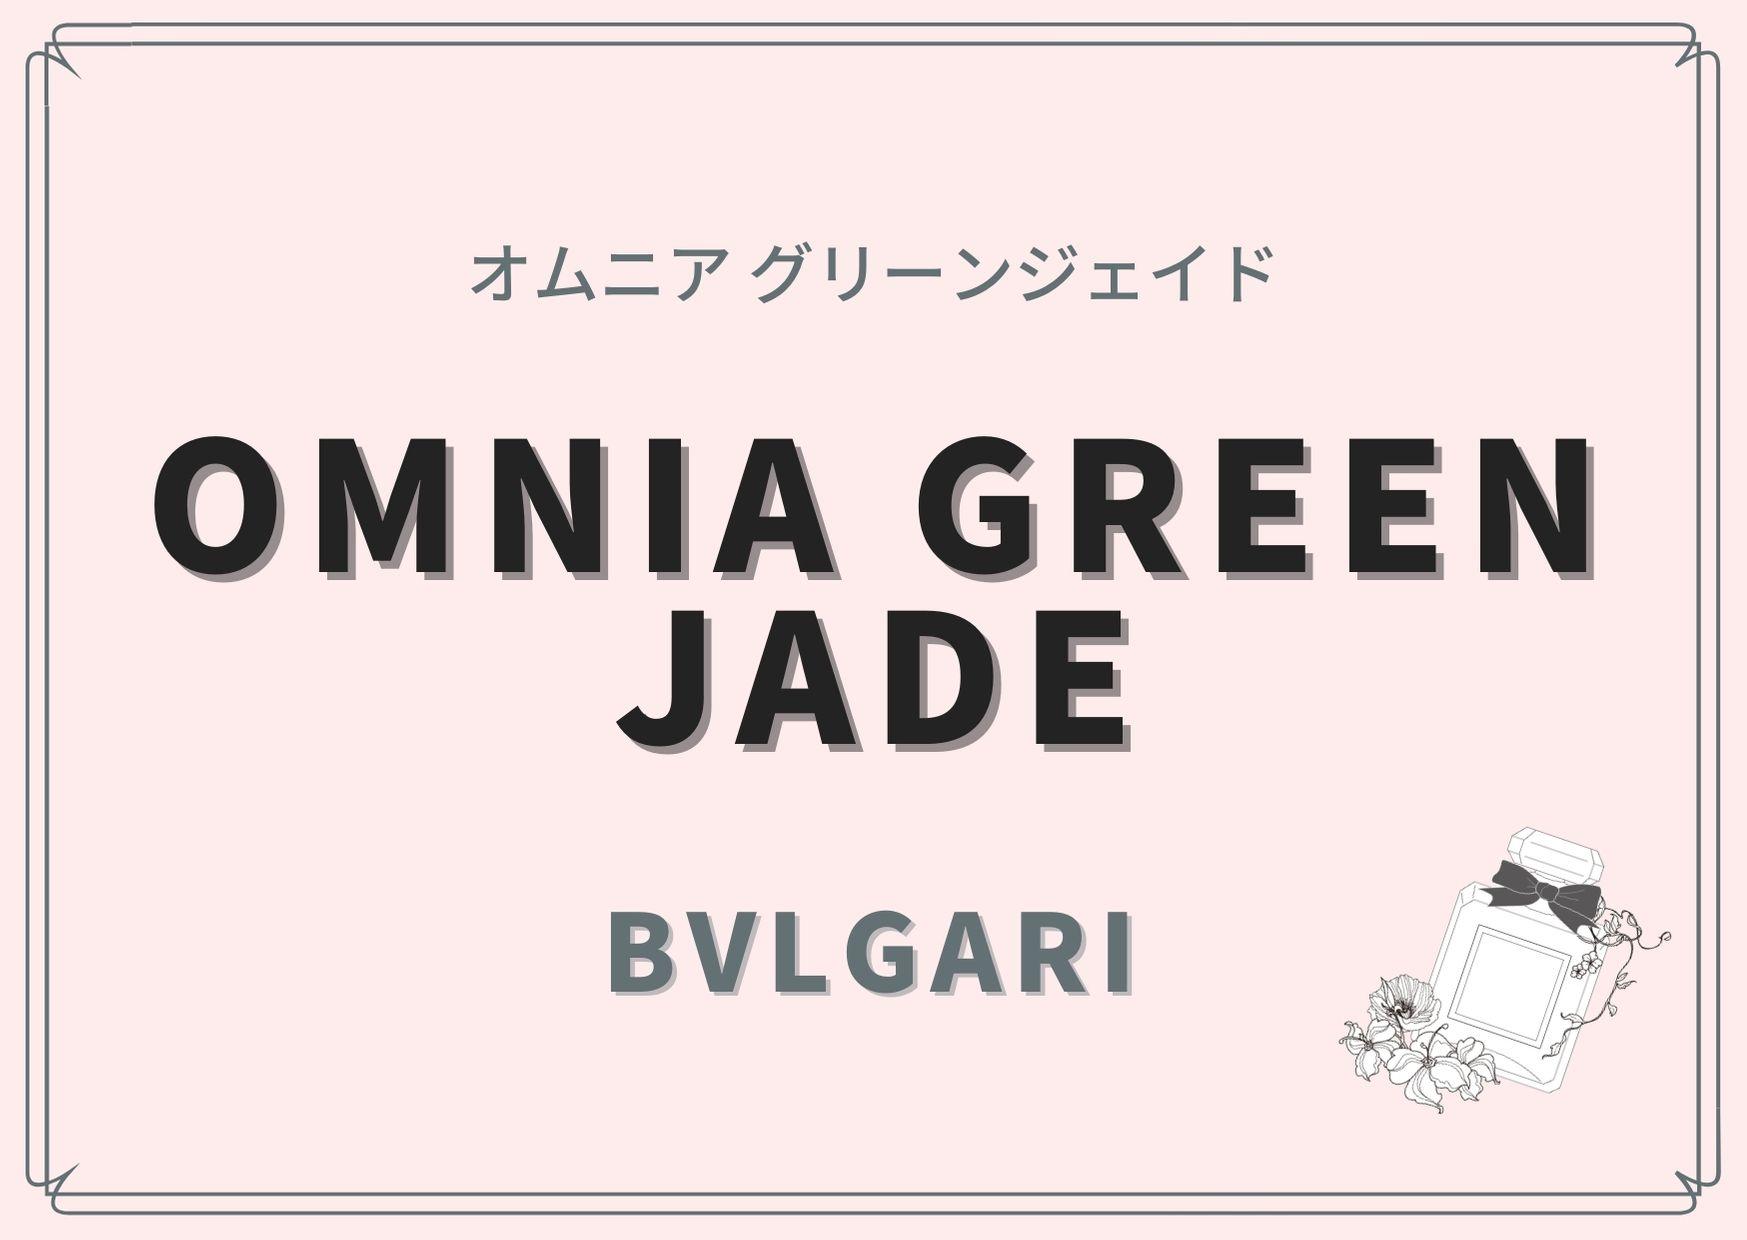 OMNIA GREEN JADE(オムニア グリーンジェイド)/ BVLGARI(ブルガリ)